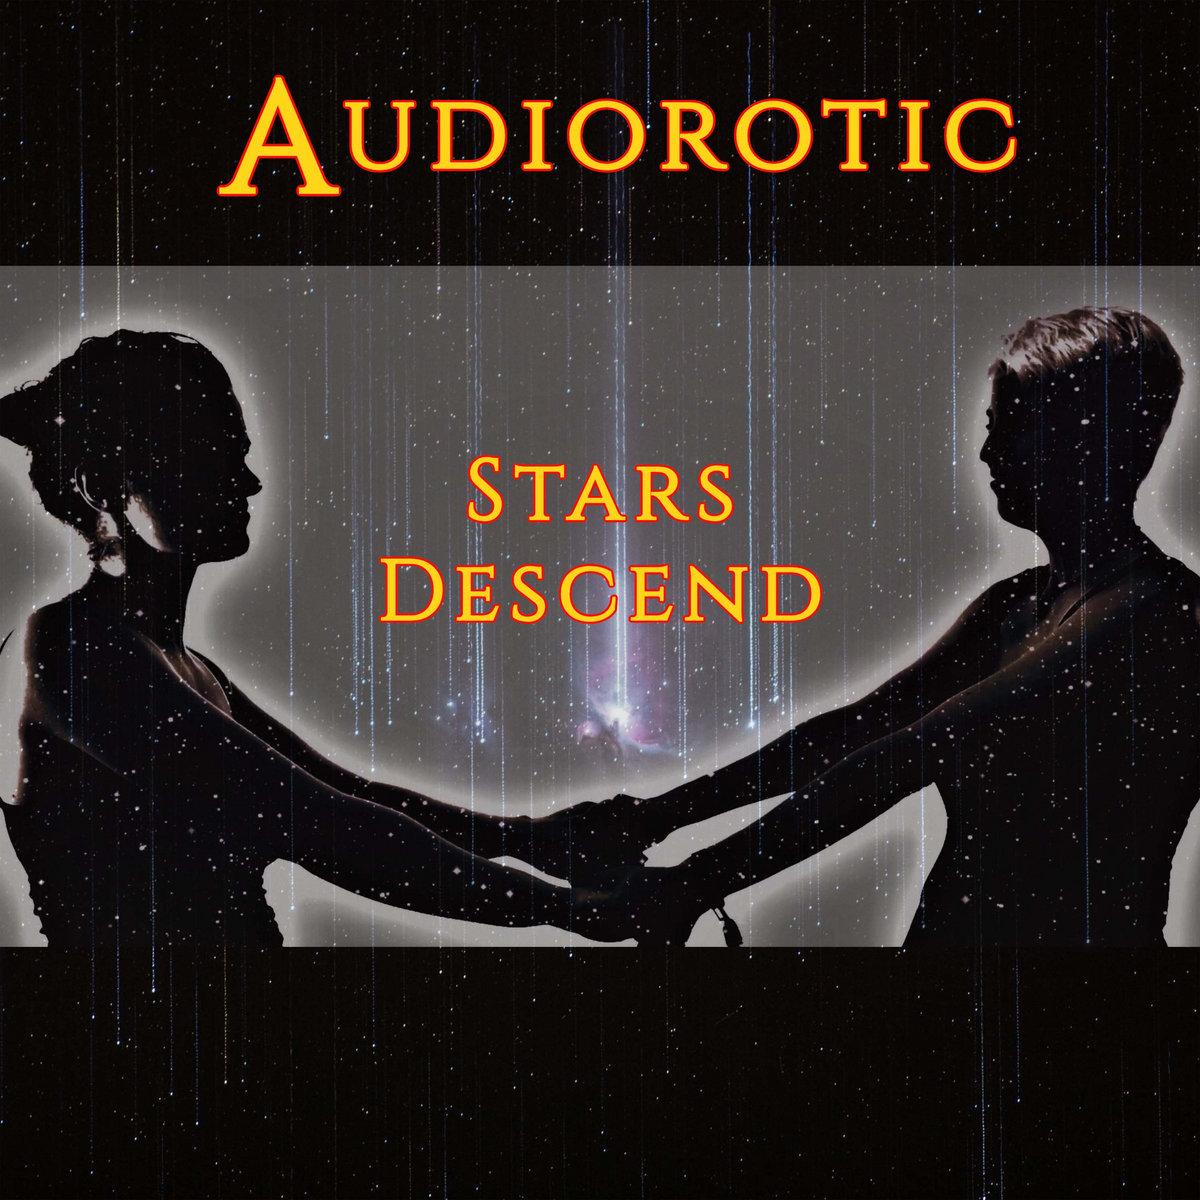 Stars Descend by Audiorotic